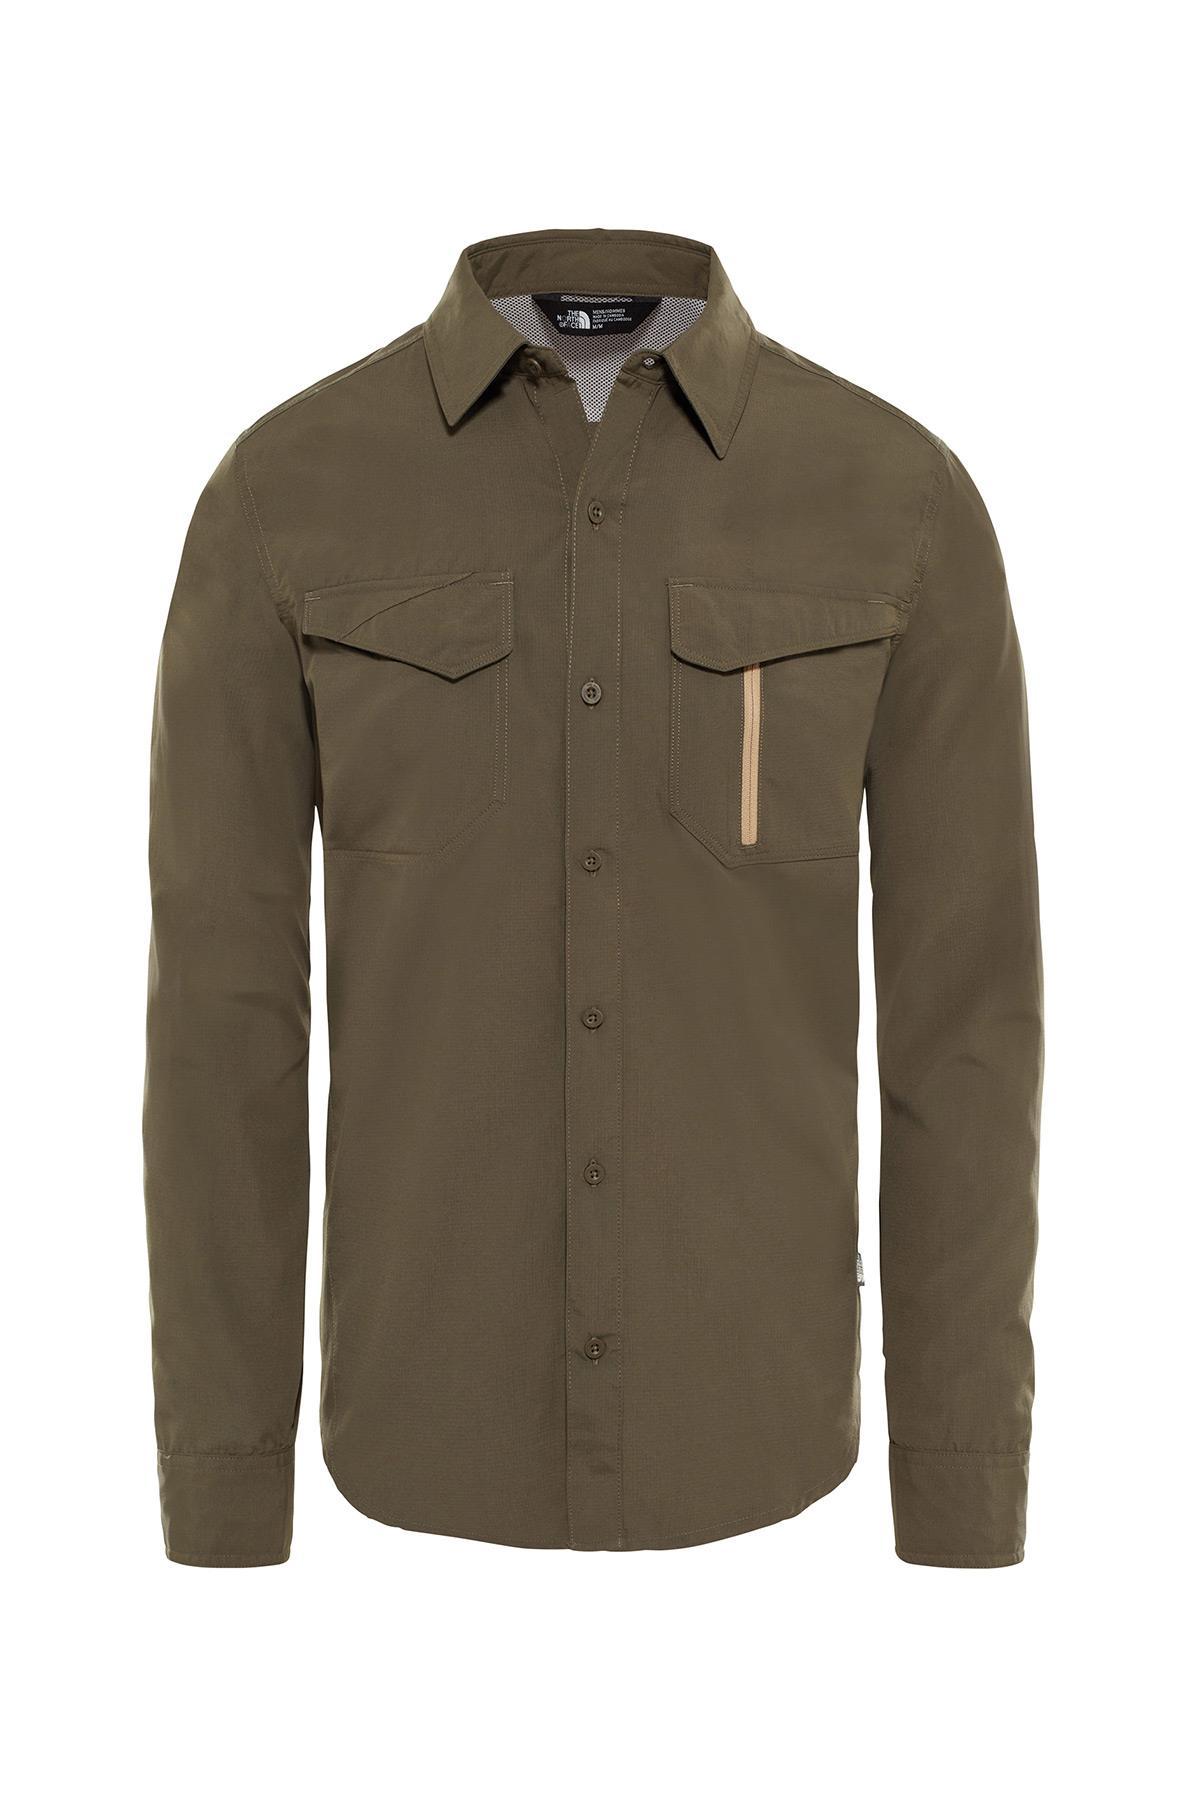 The Northface Erkek L/S Sequoia Shirt-Eu T92Xjw21L Gömlek